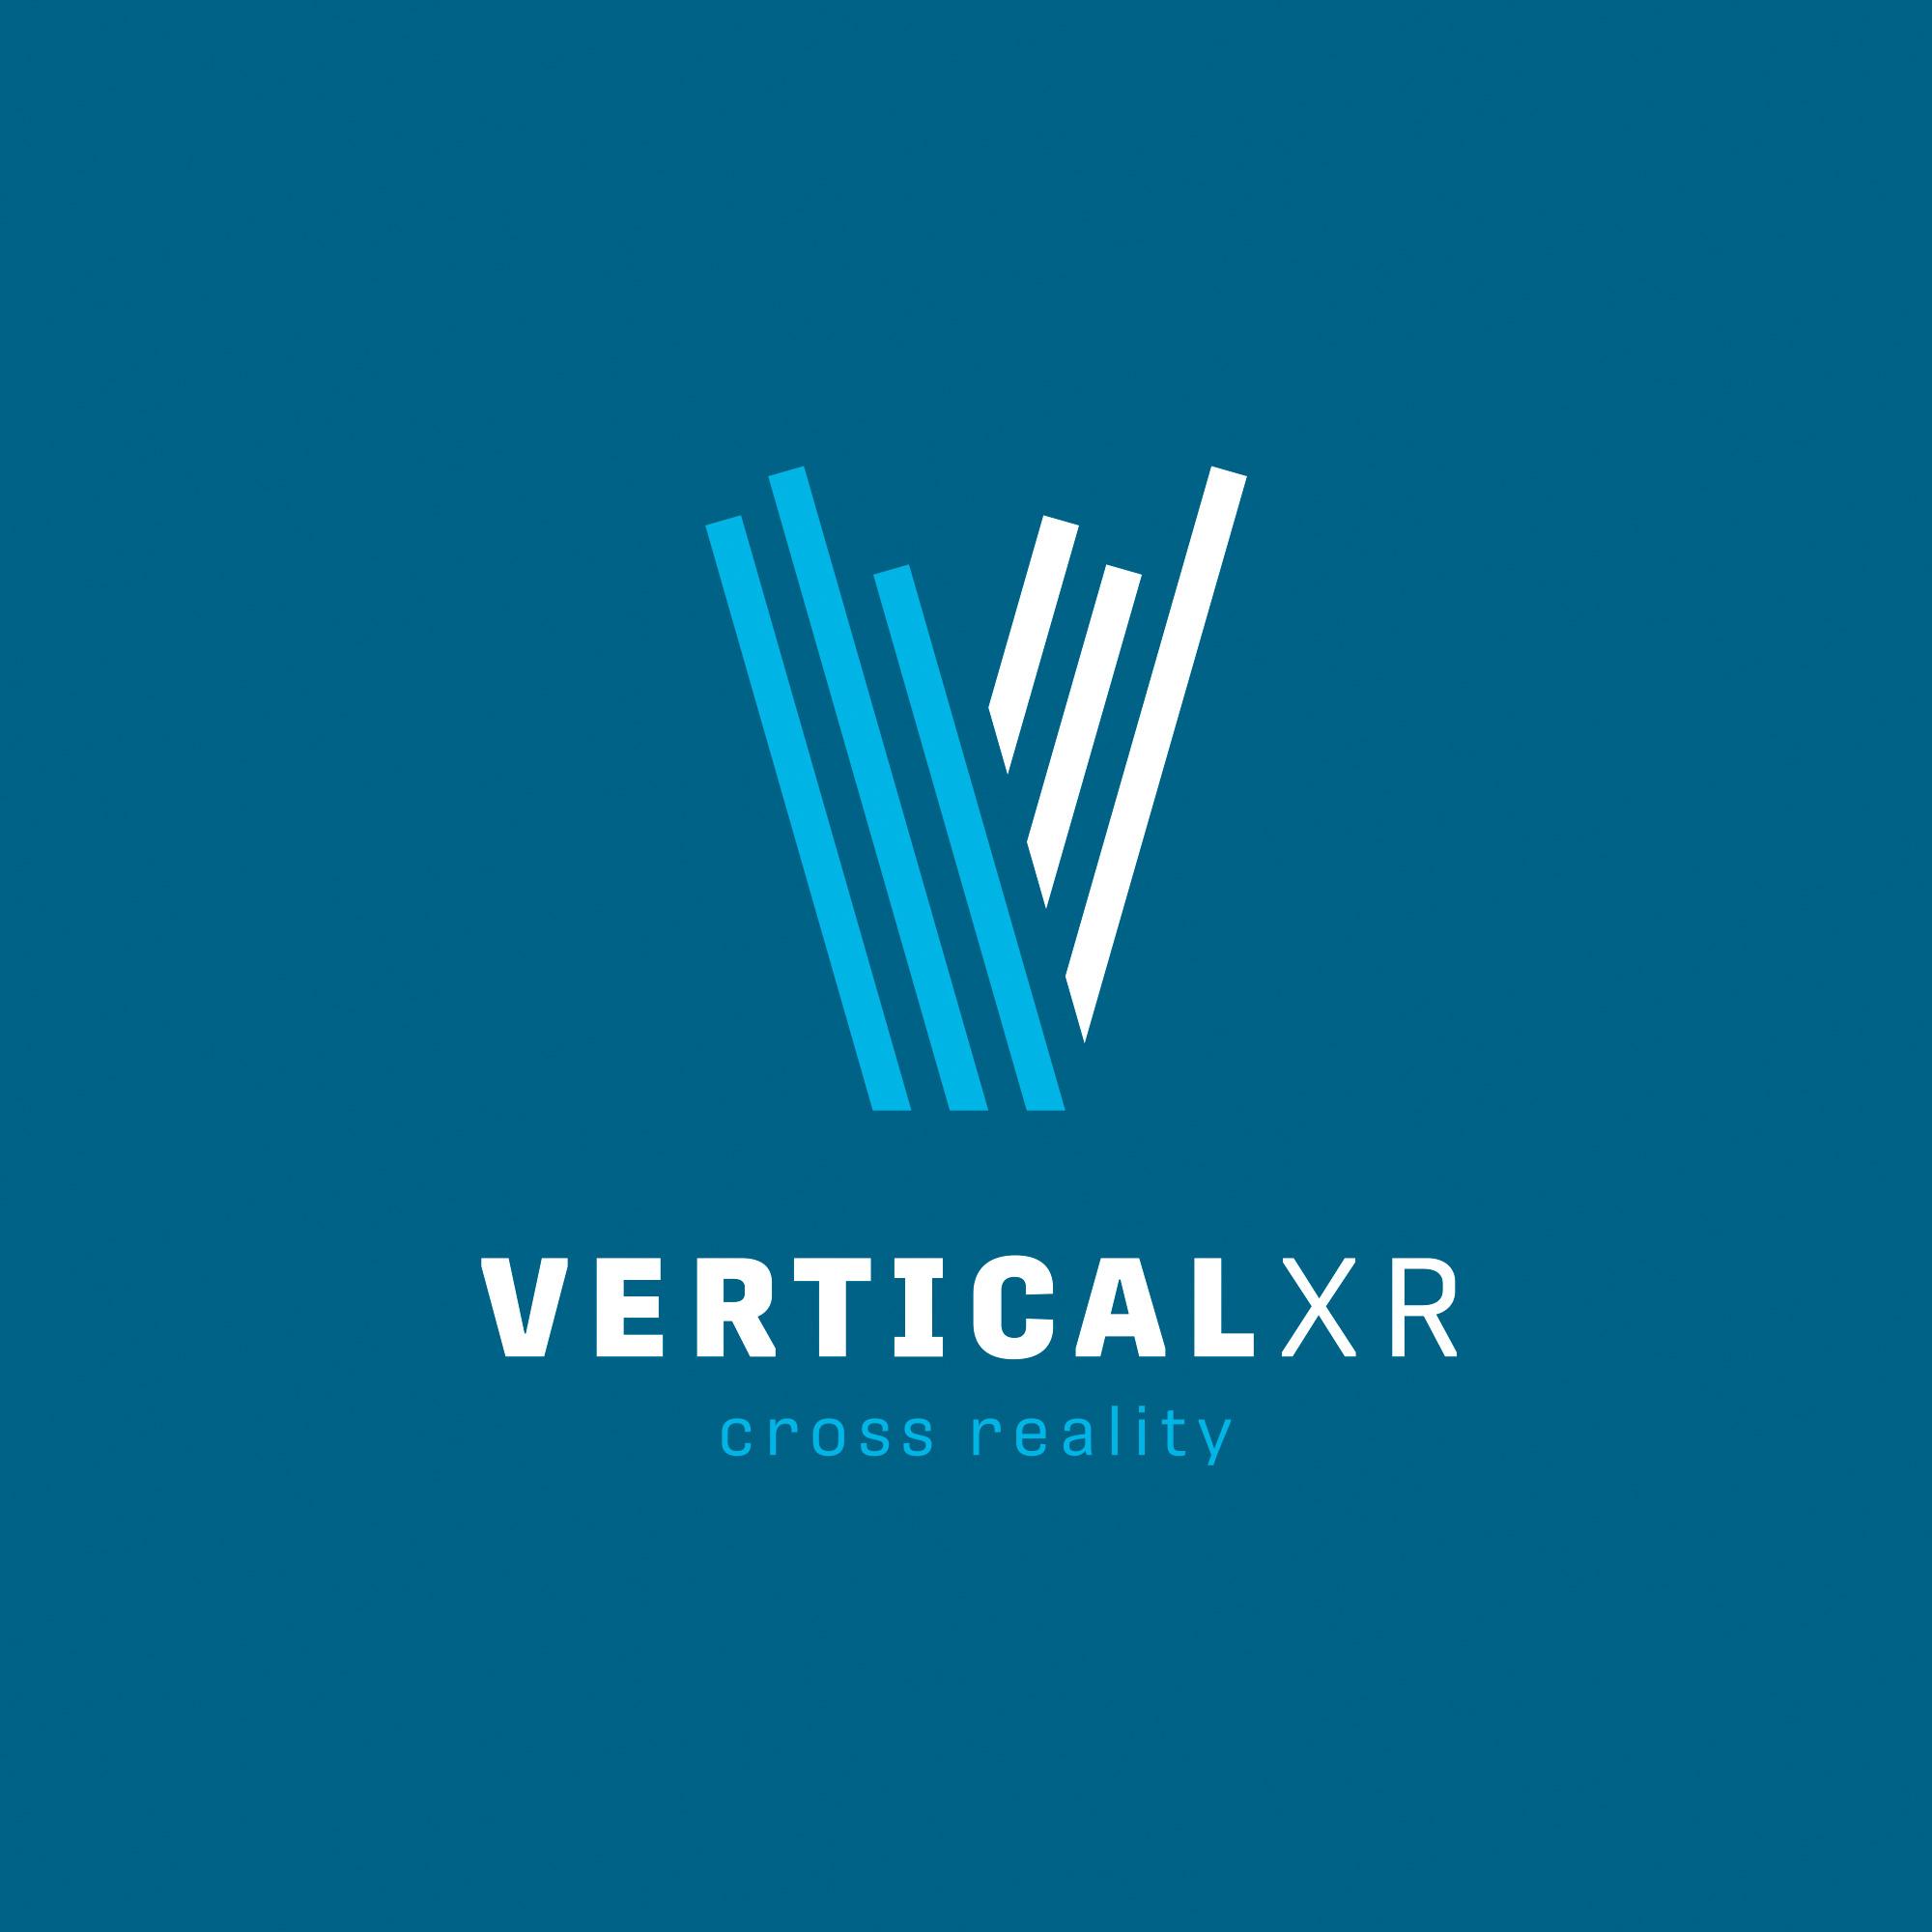 [album/Products_Model_Product/119/Vertical_XR_logo_4c_inv_B.jpg]